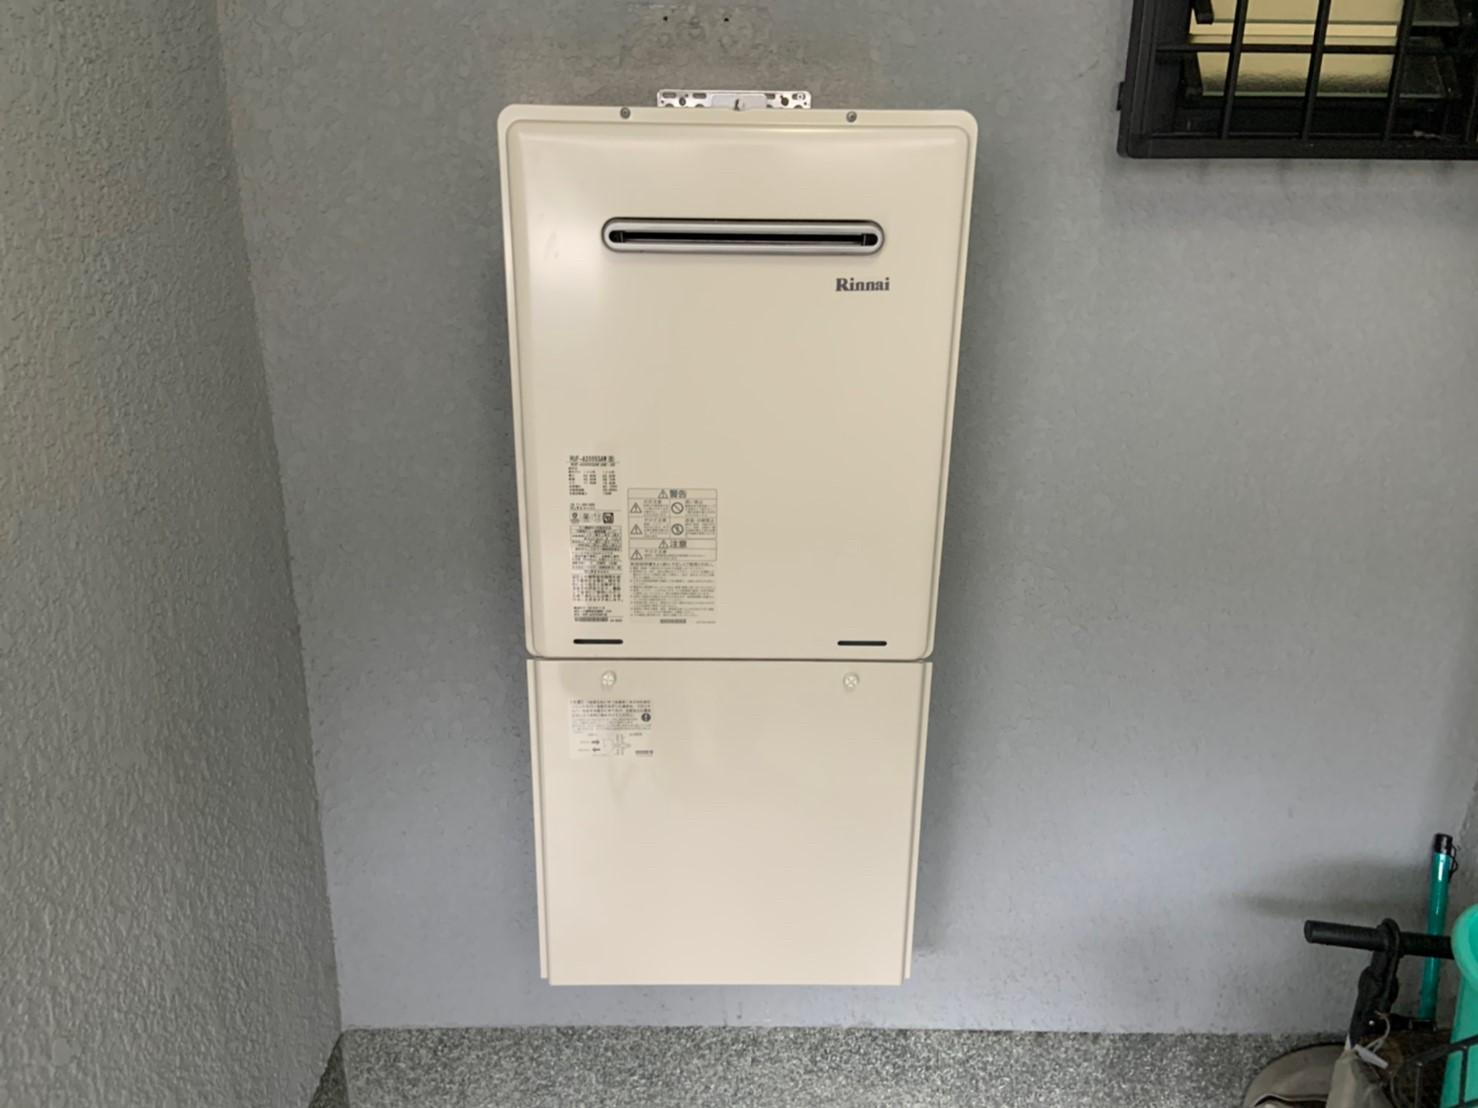 ガス給湯器の交換工事(RUF-A2005SAW)【京都市北区上賀茂】